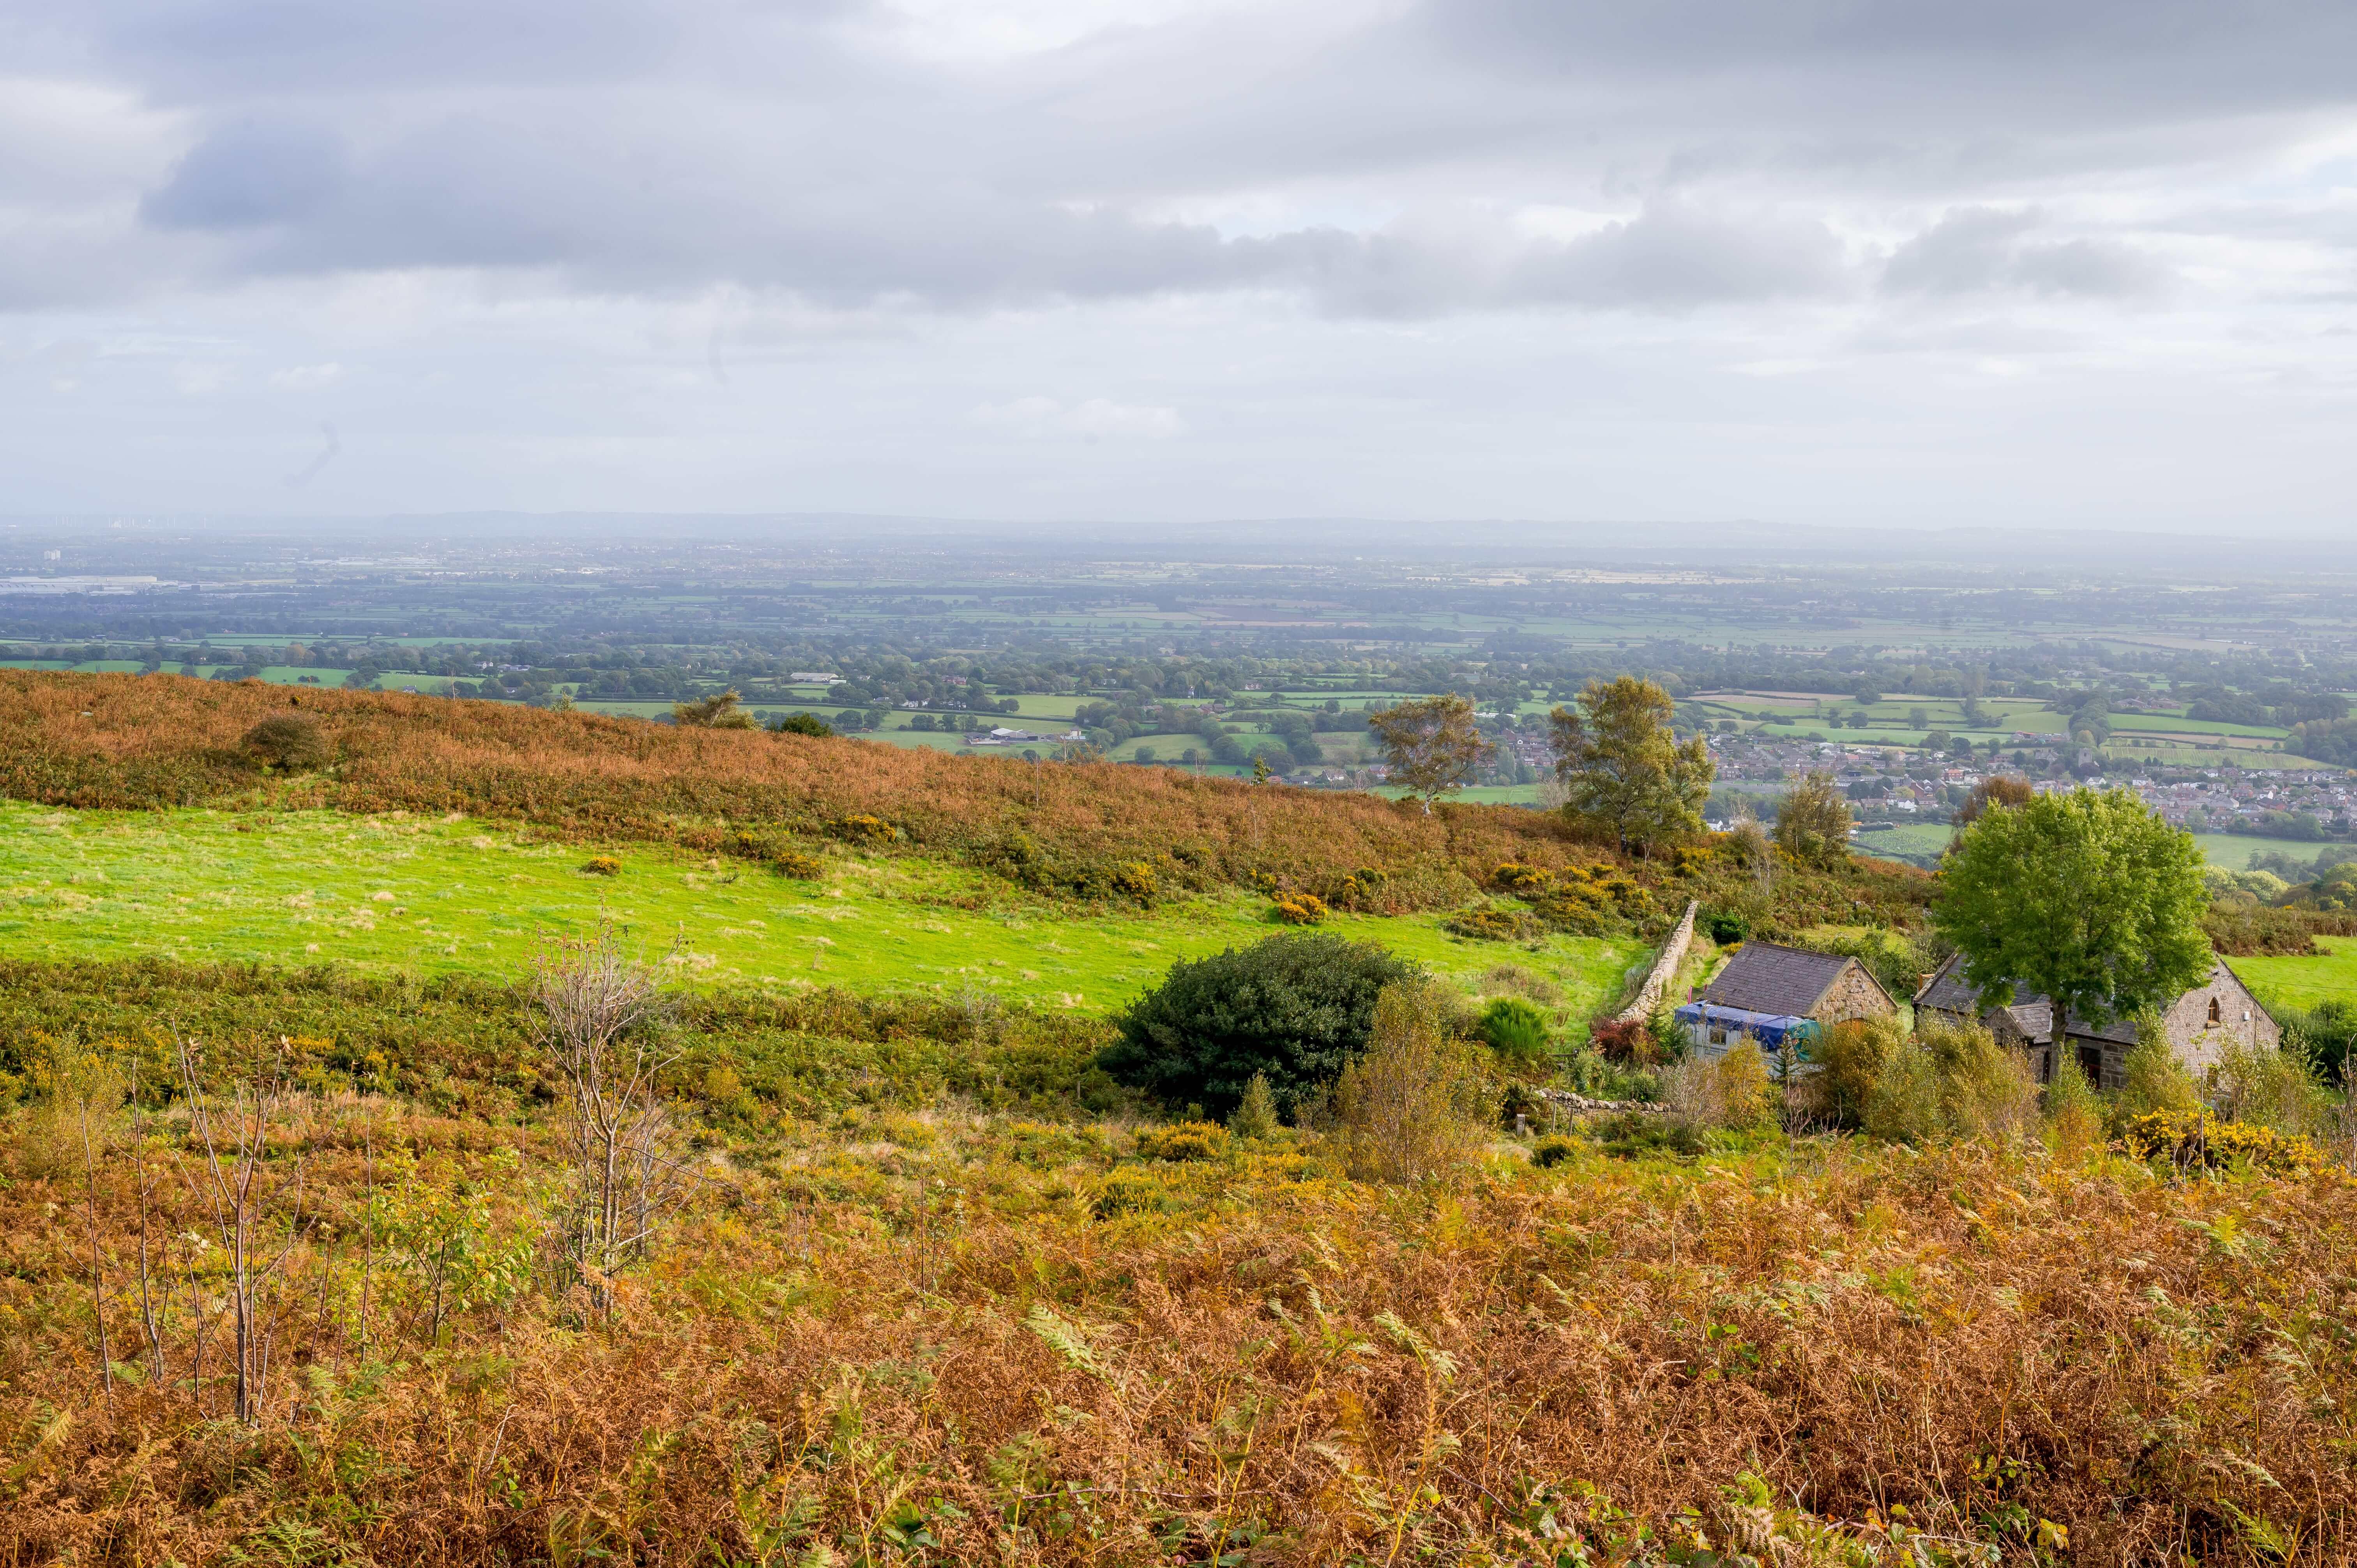 NE Wales - hope mountain - landscapes-008-min small.jpg